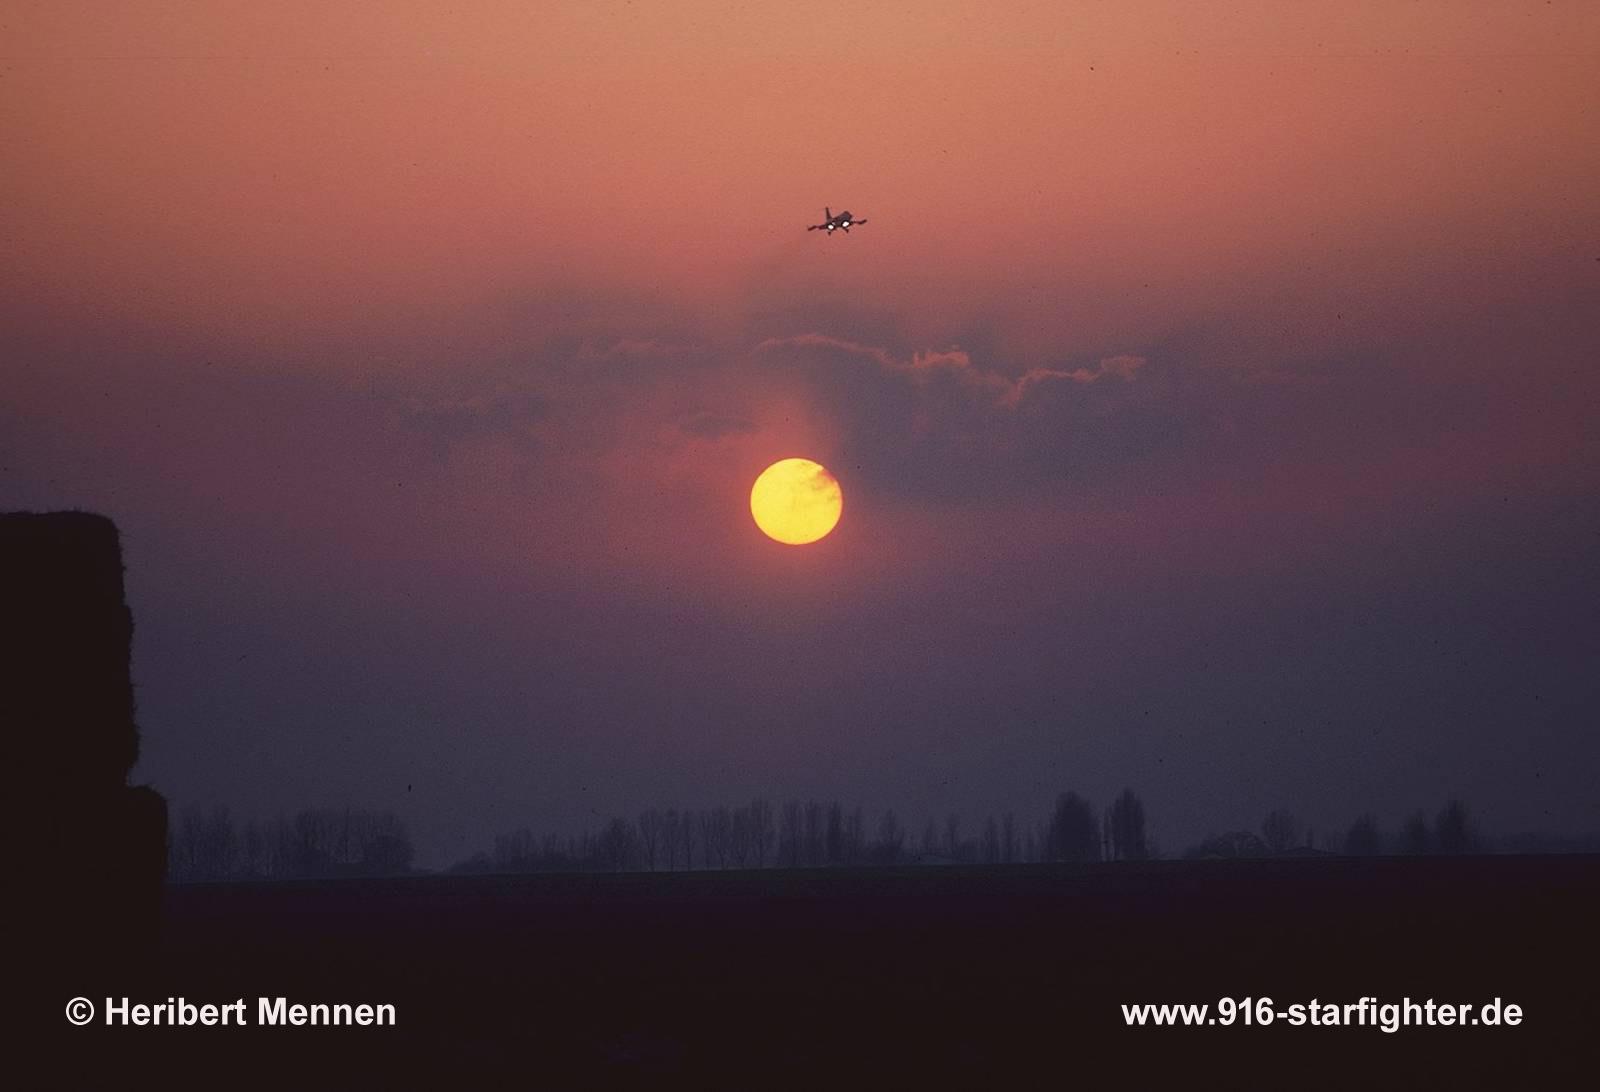 916 starfighter - Vendre des photos de star ...